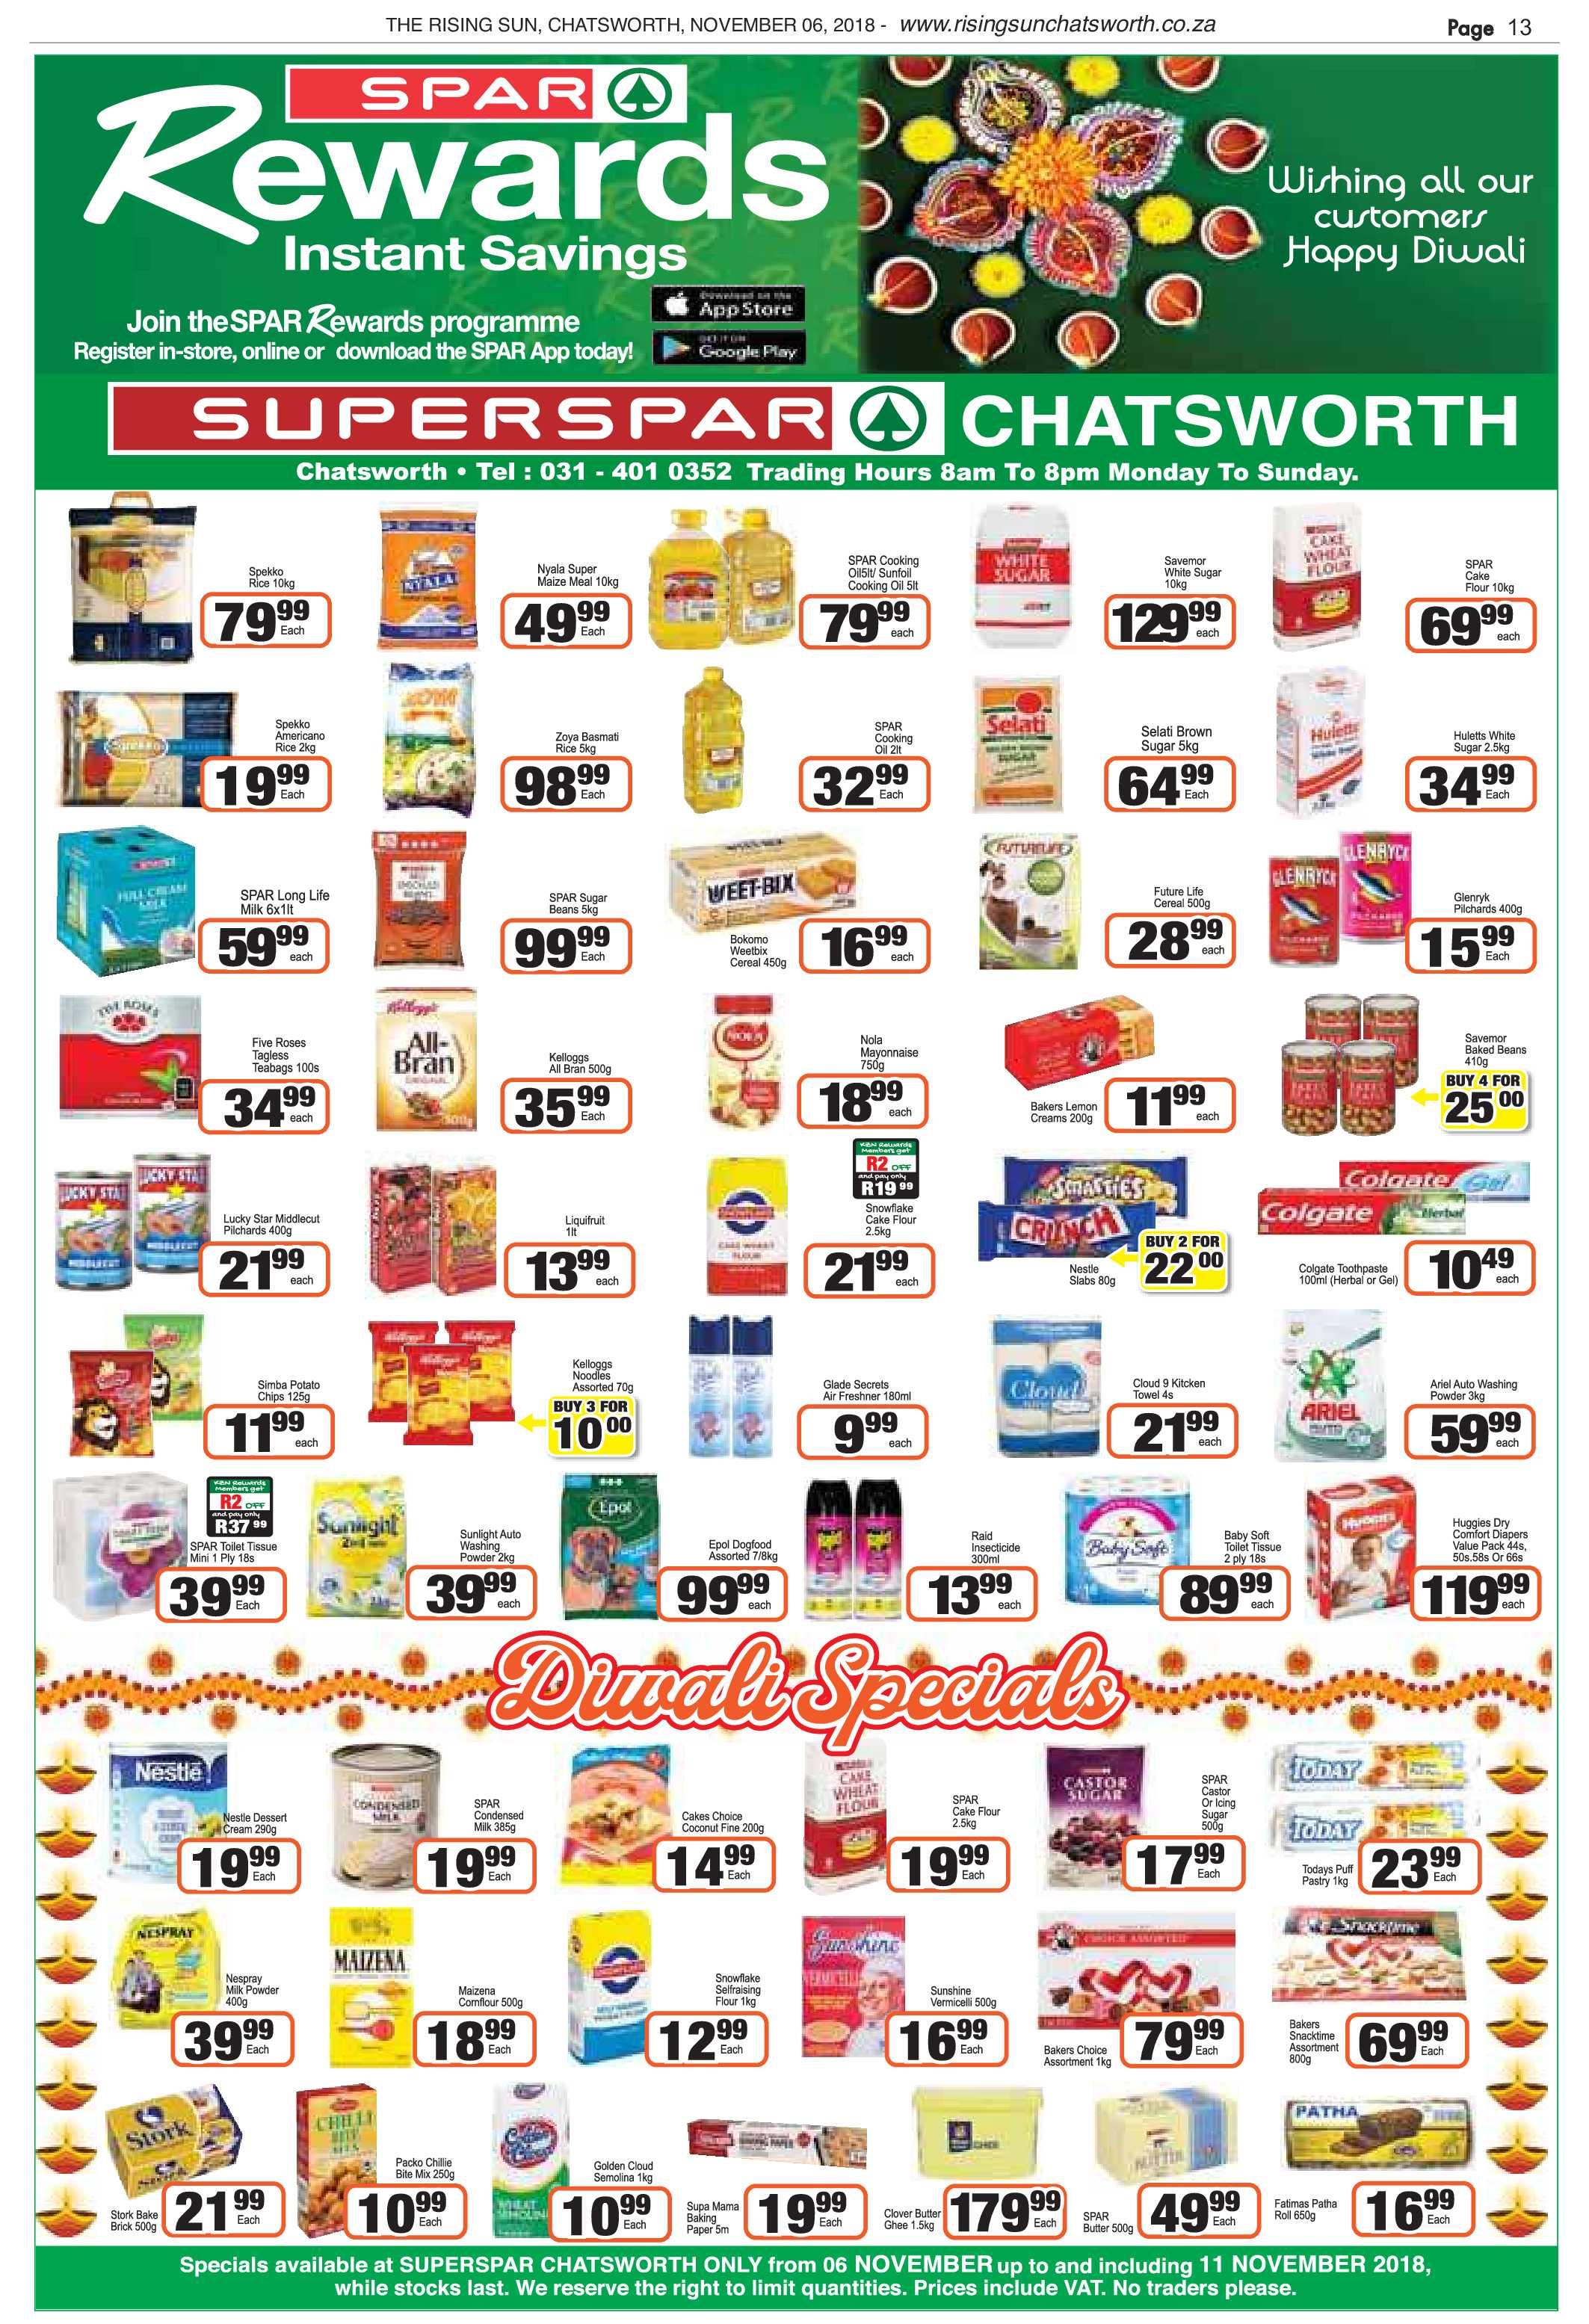 rising-sun-chatsworth-november-6-epapers-page-13